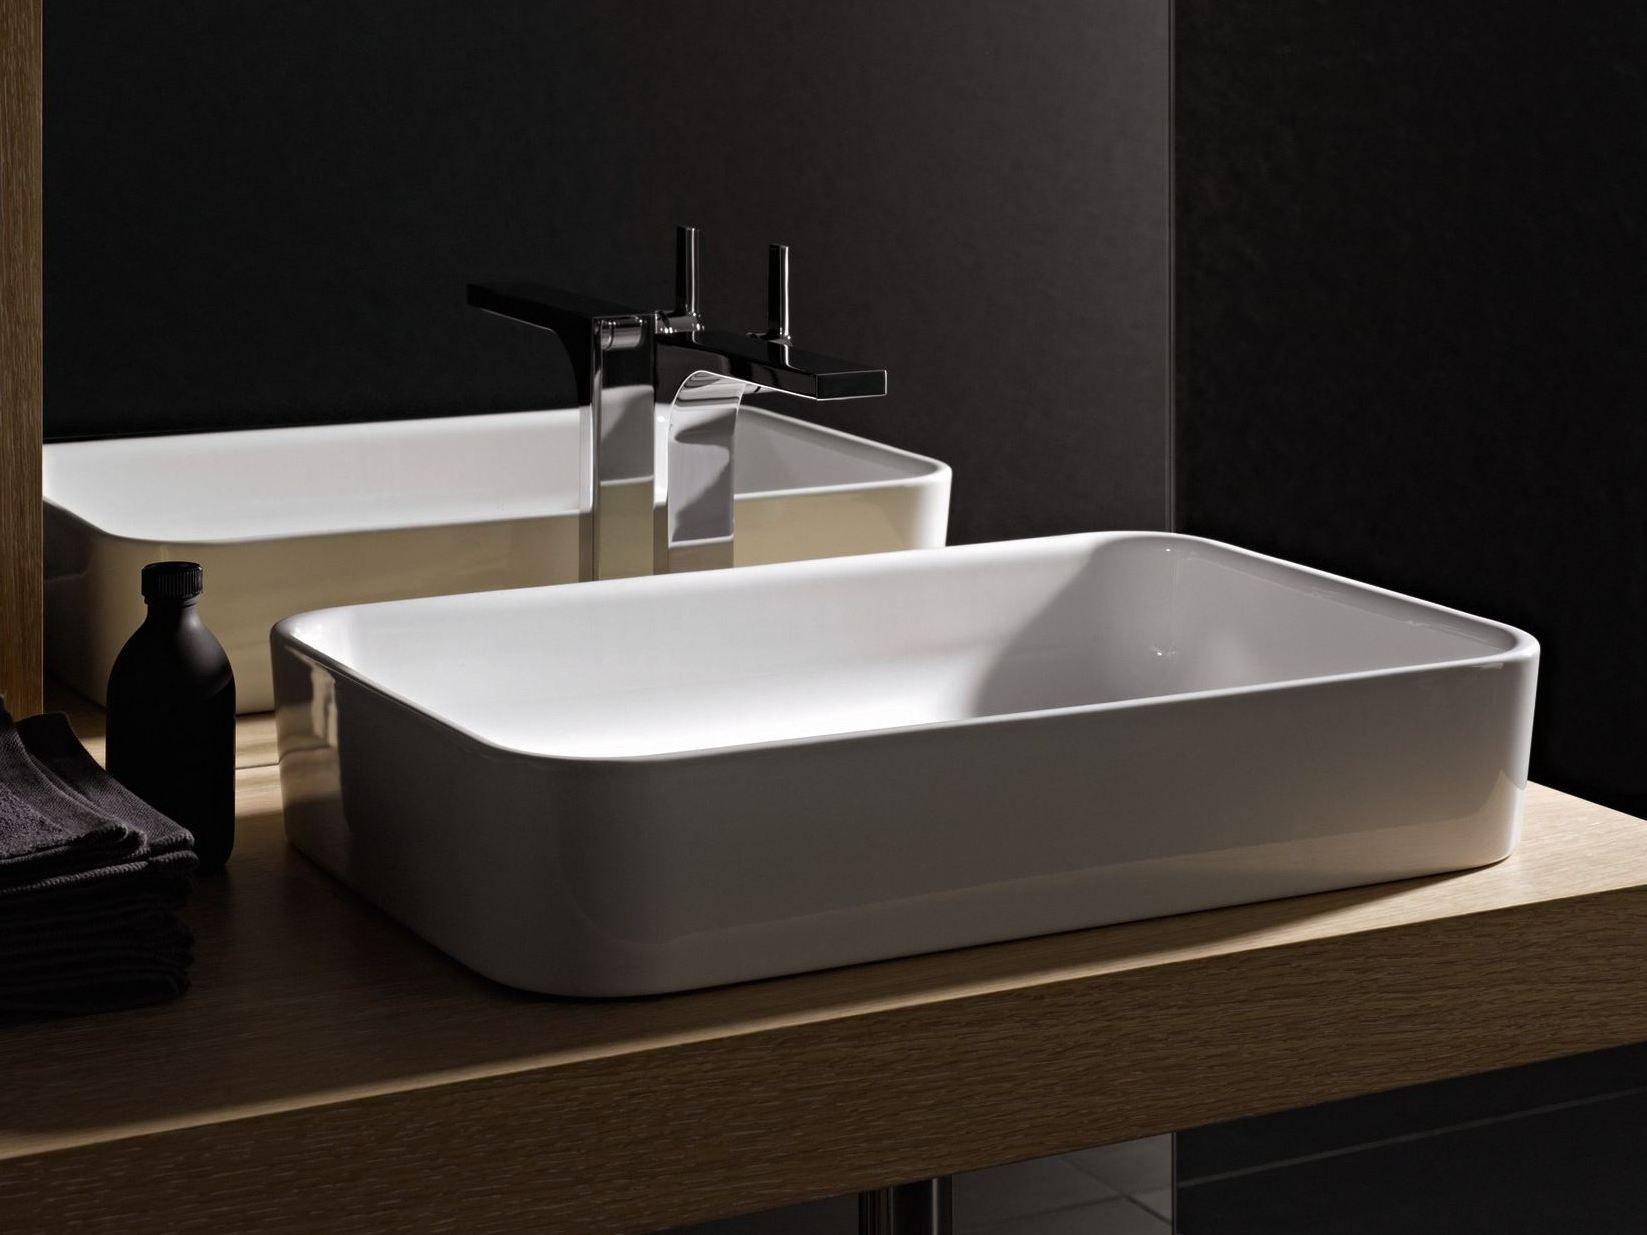 Betteart lavabo sobre encimera by bette dise o tesseraux - Lavabos rectangulares sobre encimera ...